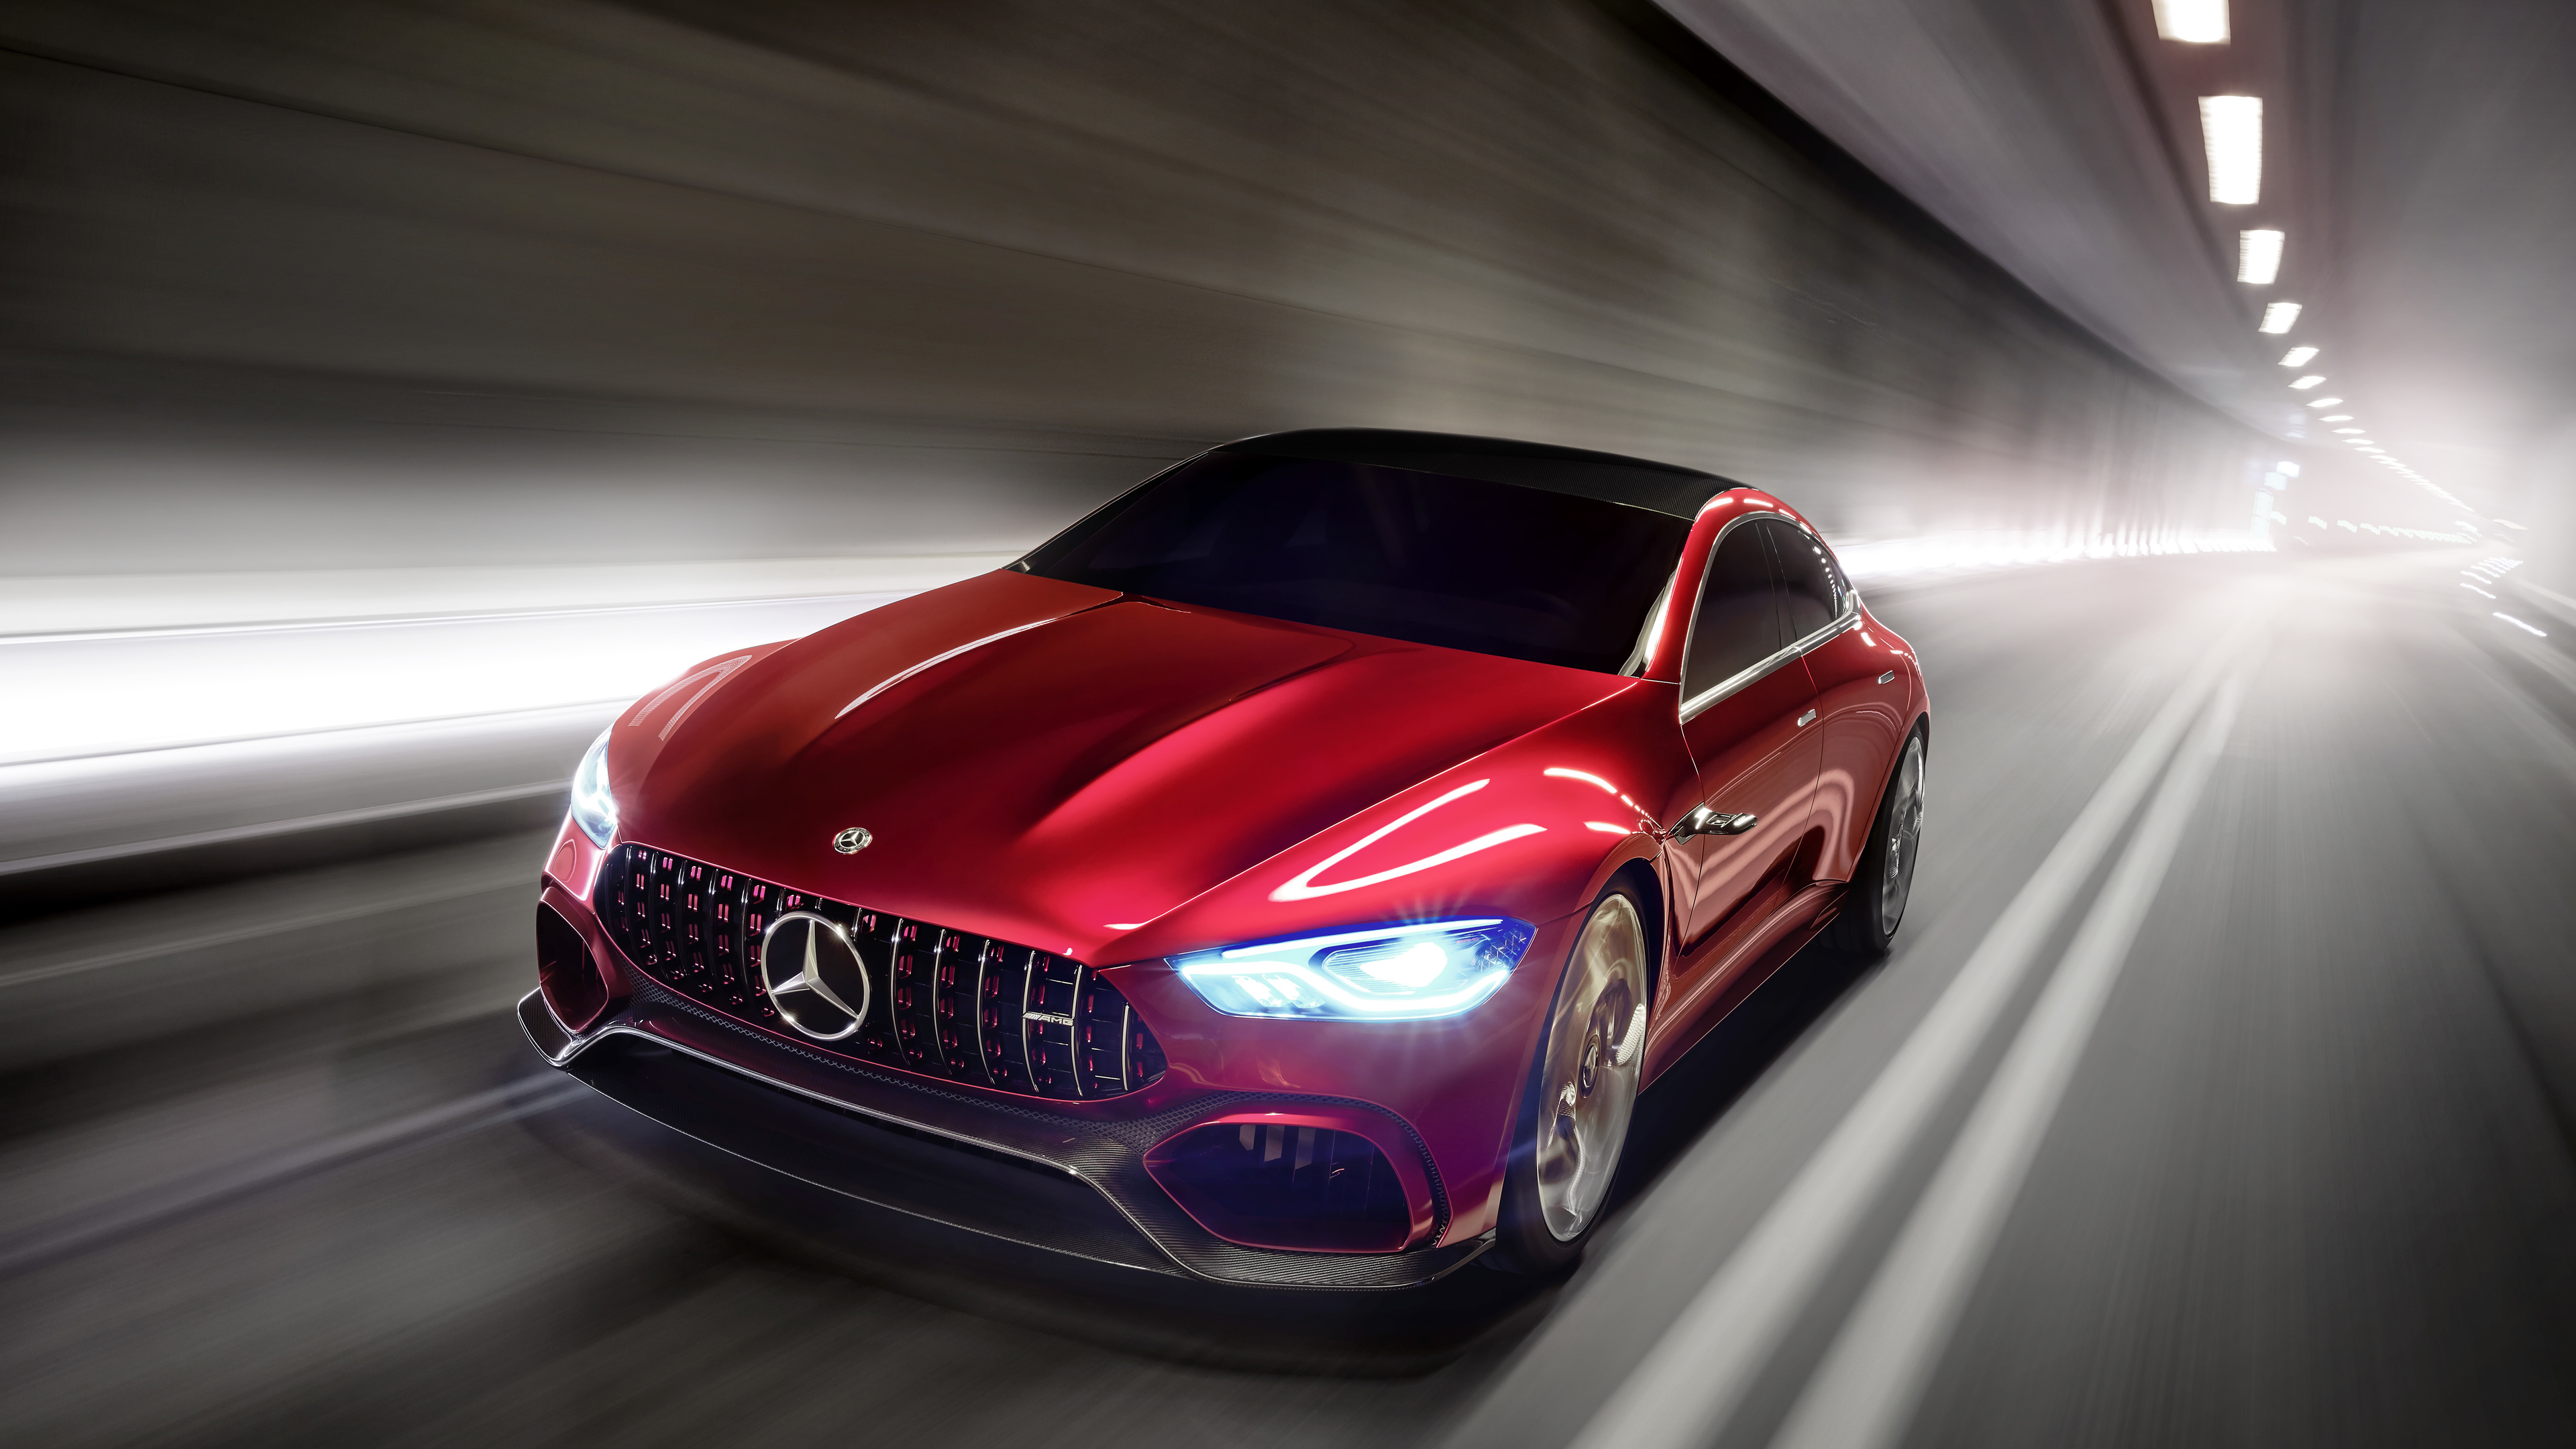 mercedes amg gt 8k 1539113577 - Mercedes AMG GT 8k - mercedes wallpapers, mercedes amg gt wallpapers, hd-wallpapers, cars wallpapers, 8k wallpapers, 5k wallpapers, 4k-wallpapers, 2018 cars wallpapers